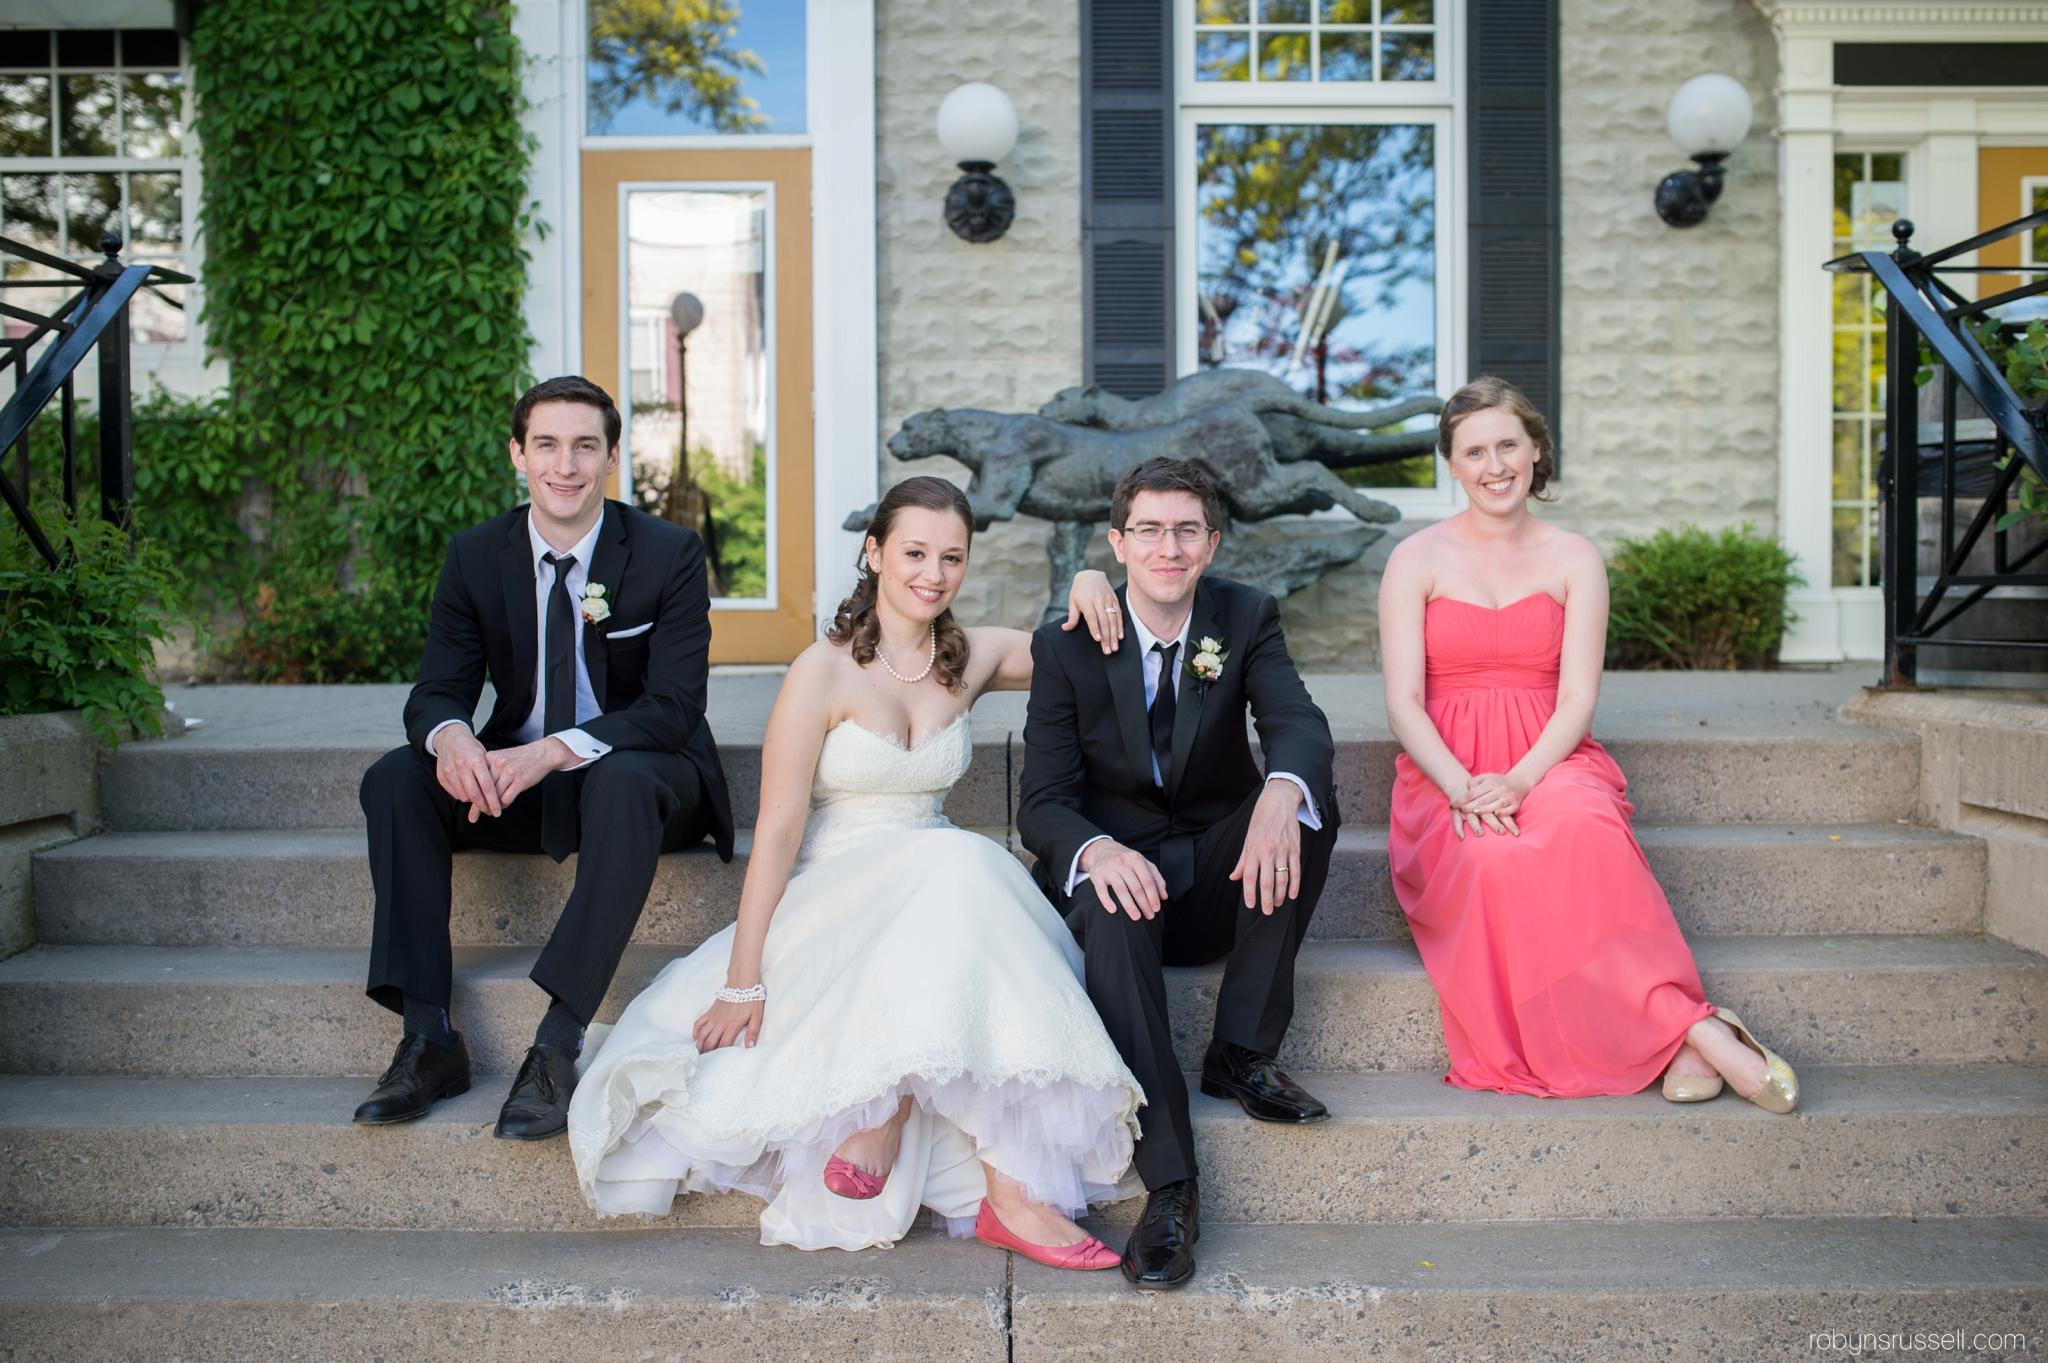 34-bridal-party-at-inn-on-the-twenty.jpg